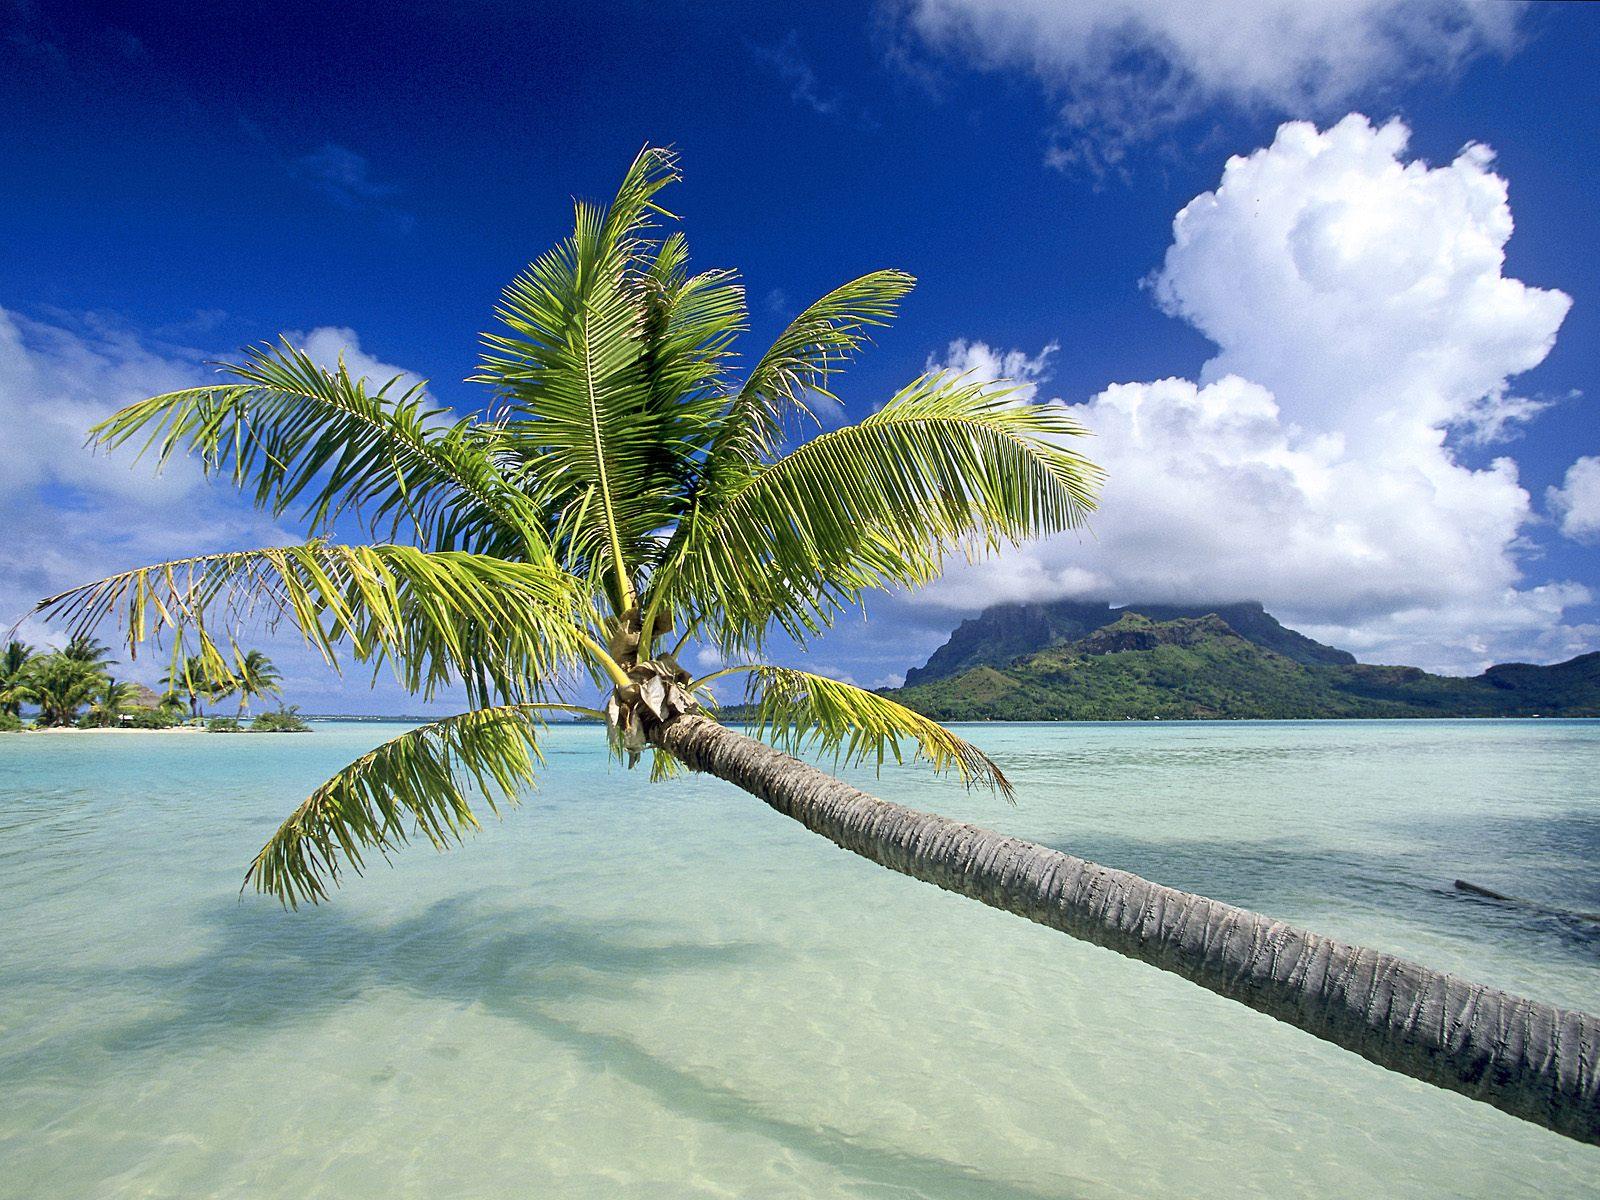 http://2.bp.blogspot.com/-kbUDavZEO7A/TiRYRUU6hzI/AAAAAAAACtQ/TPTAVFCu6rU/s1600/tropical%252Bisland%252Bwallpaper1.jpg